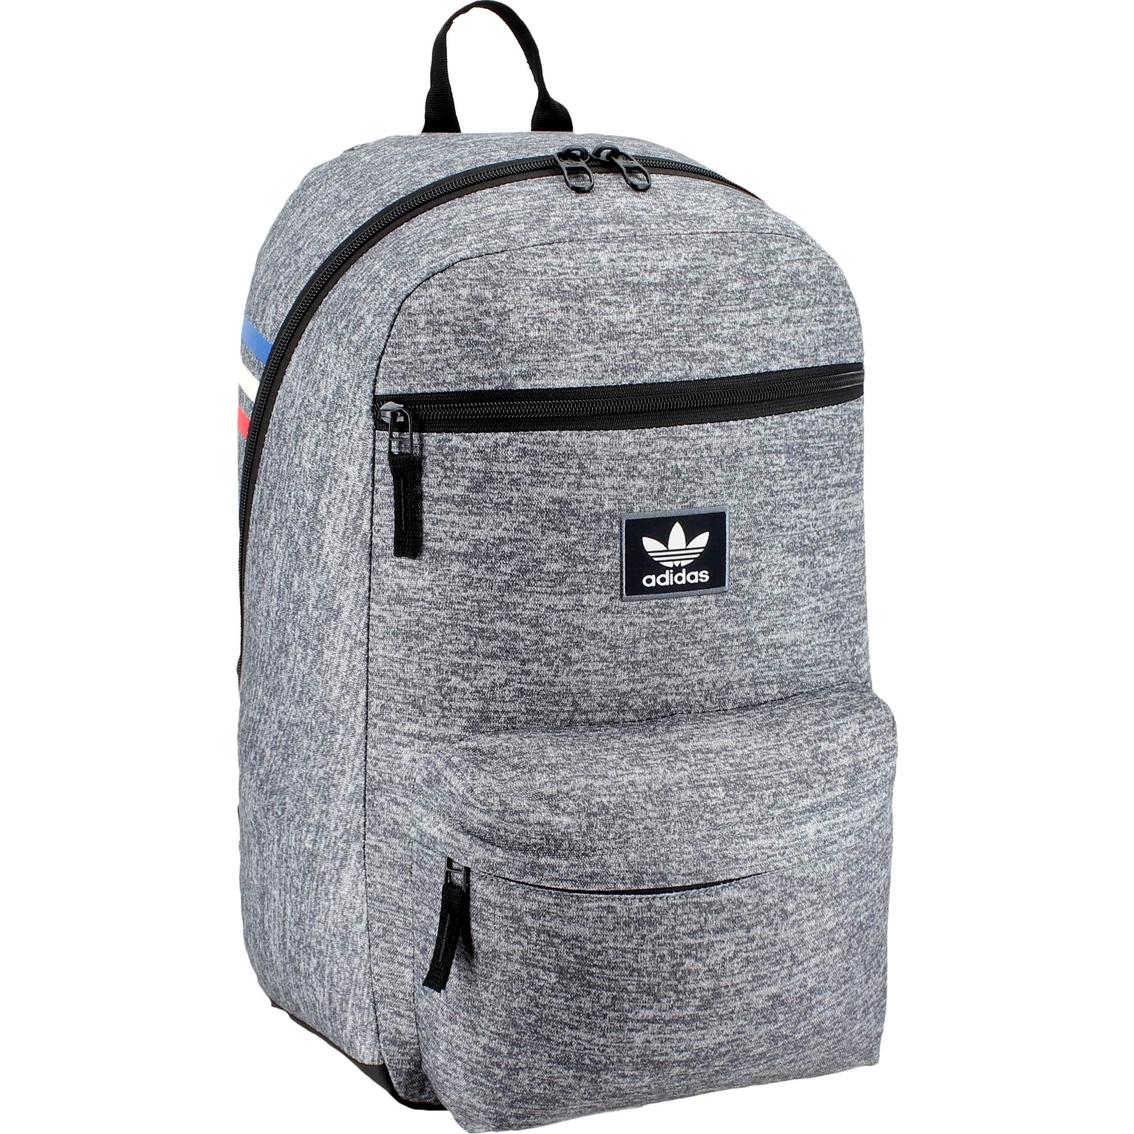 858f3585414be2 Adidas Originals National Backpack